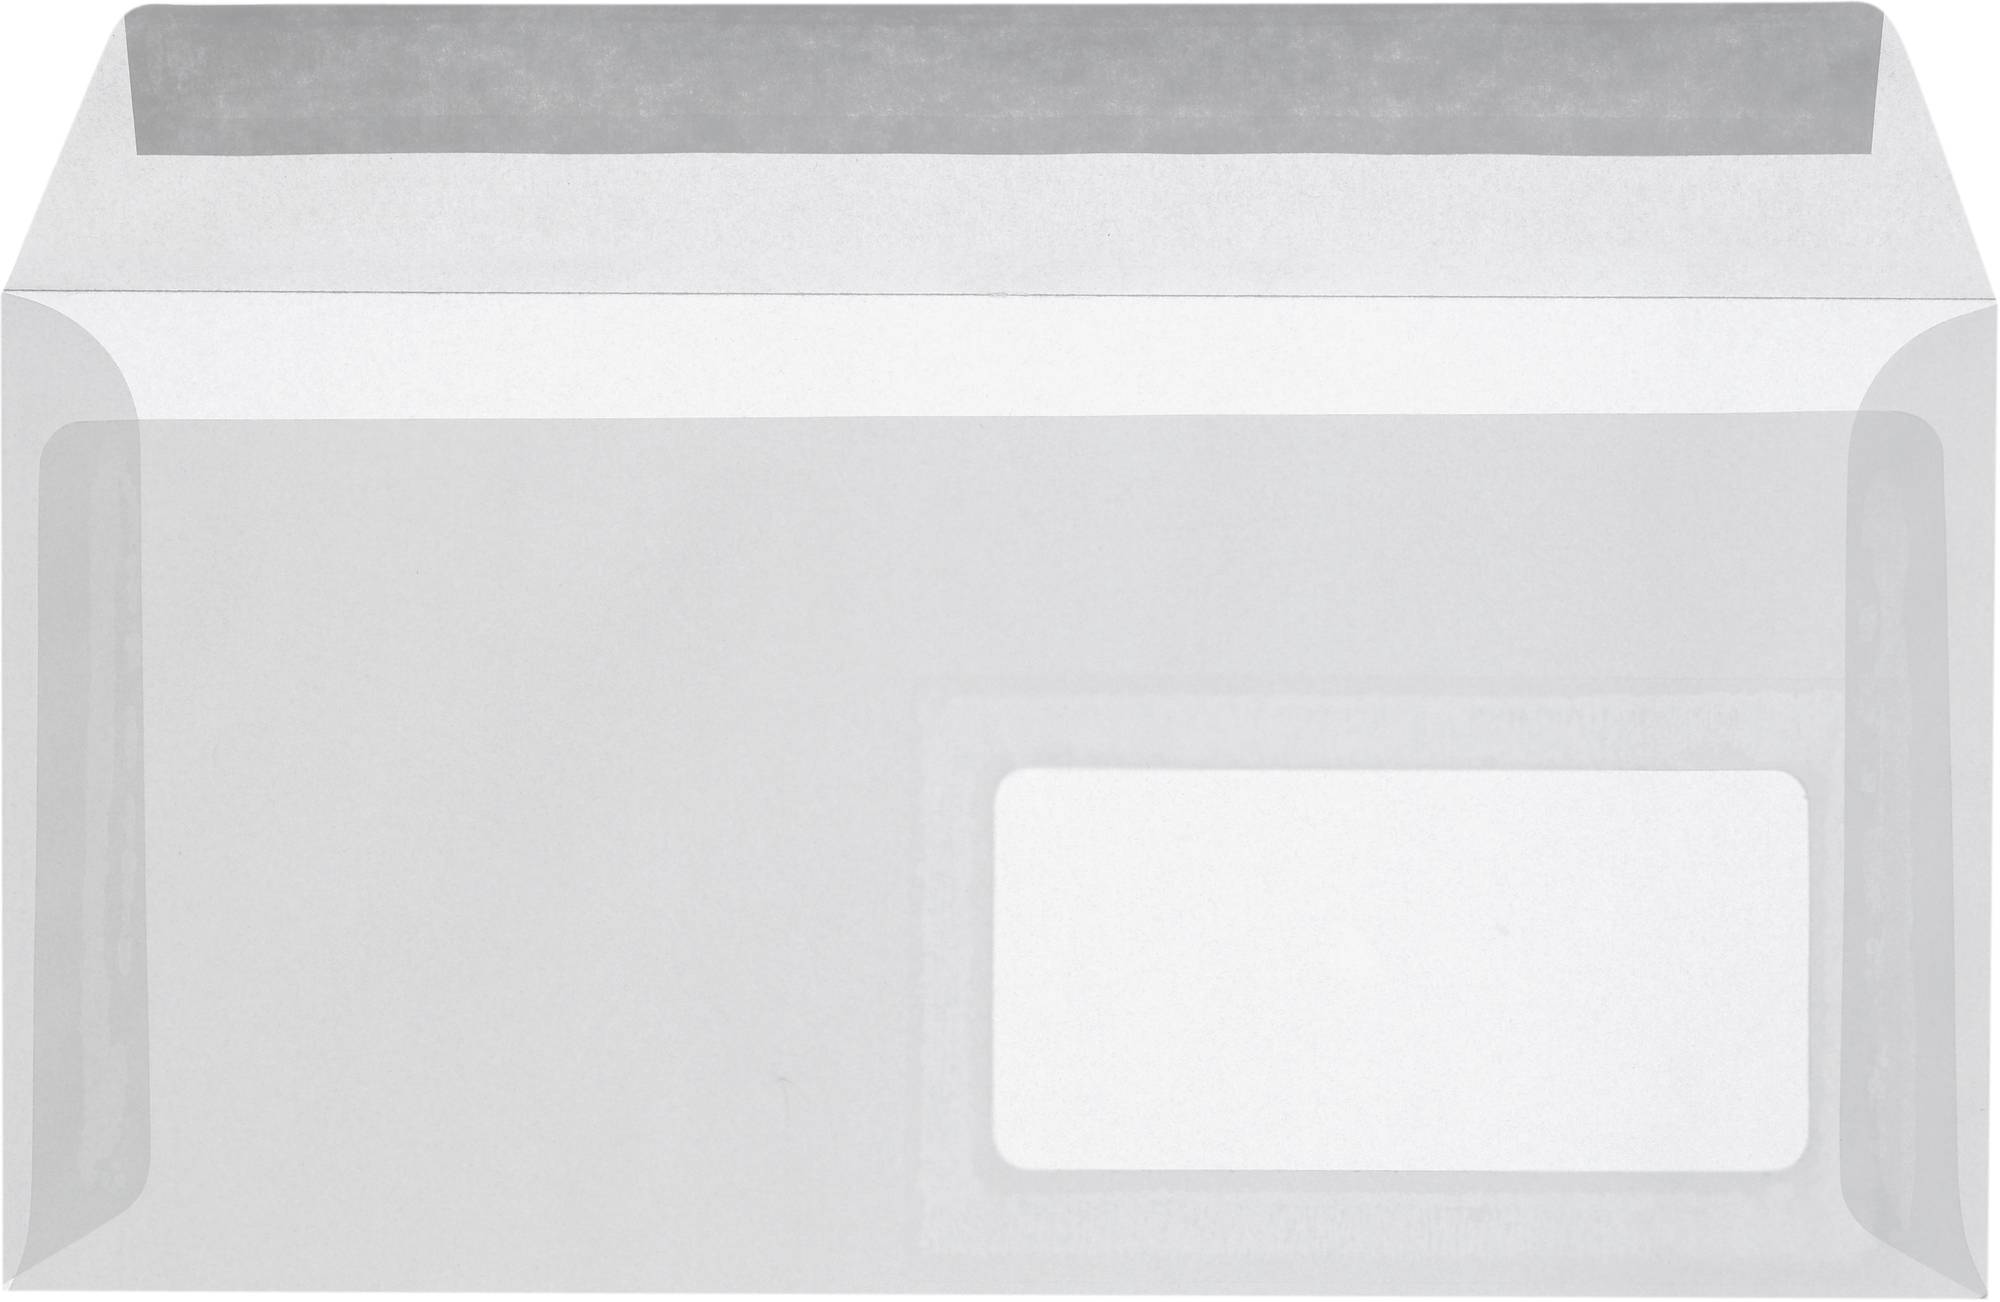 Transparenter Briefumschlag mit Fenster in DIN lang